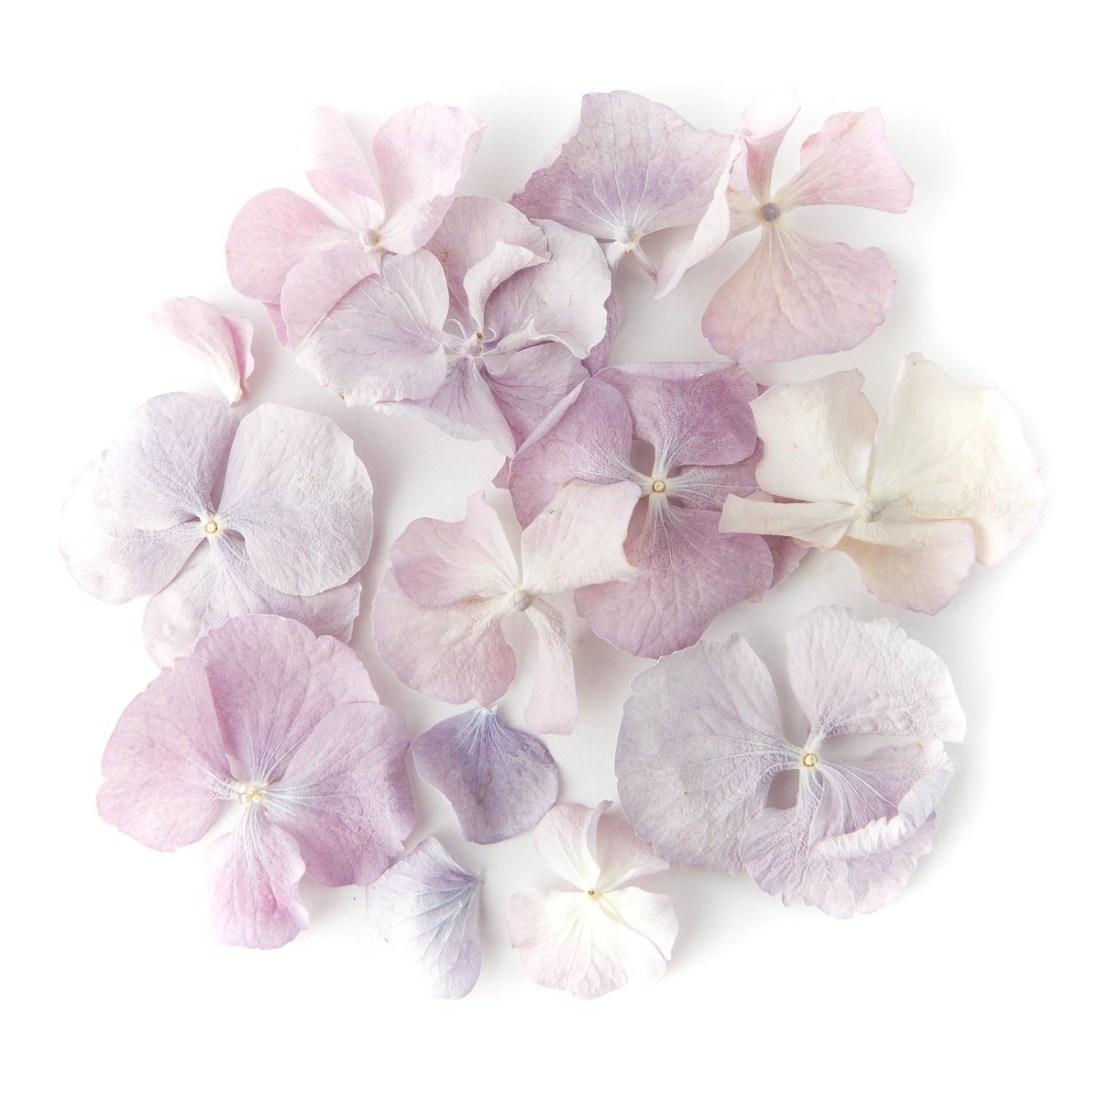 Flower petals - wedding aisles and petal pathways: Vintage Lilac Hydrangea Petals